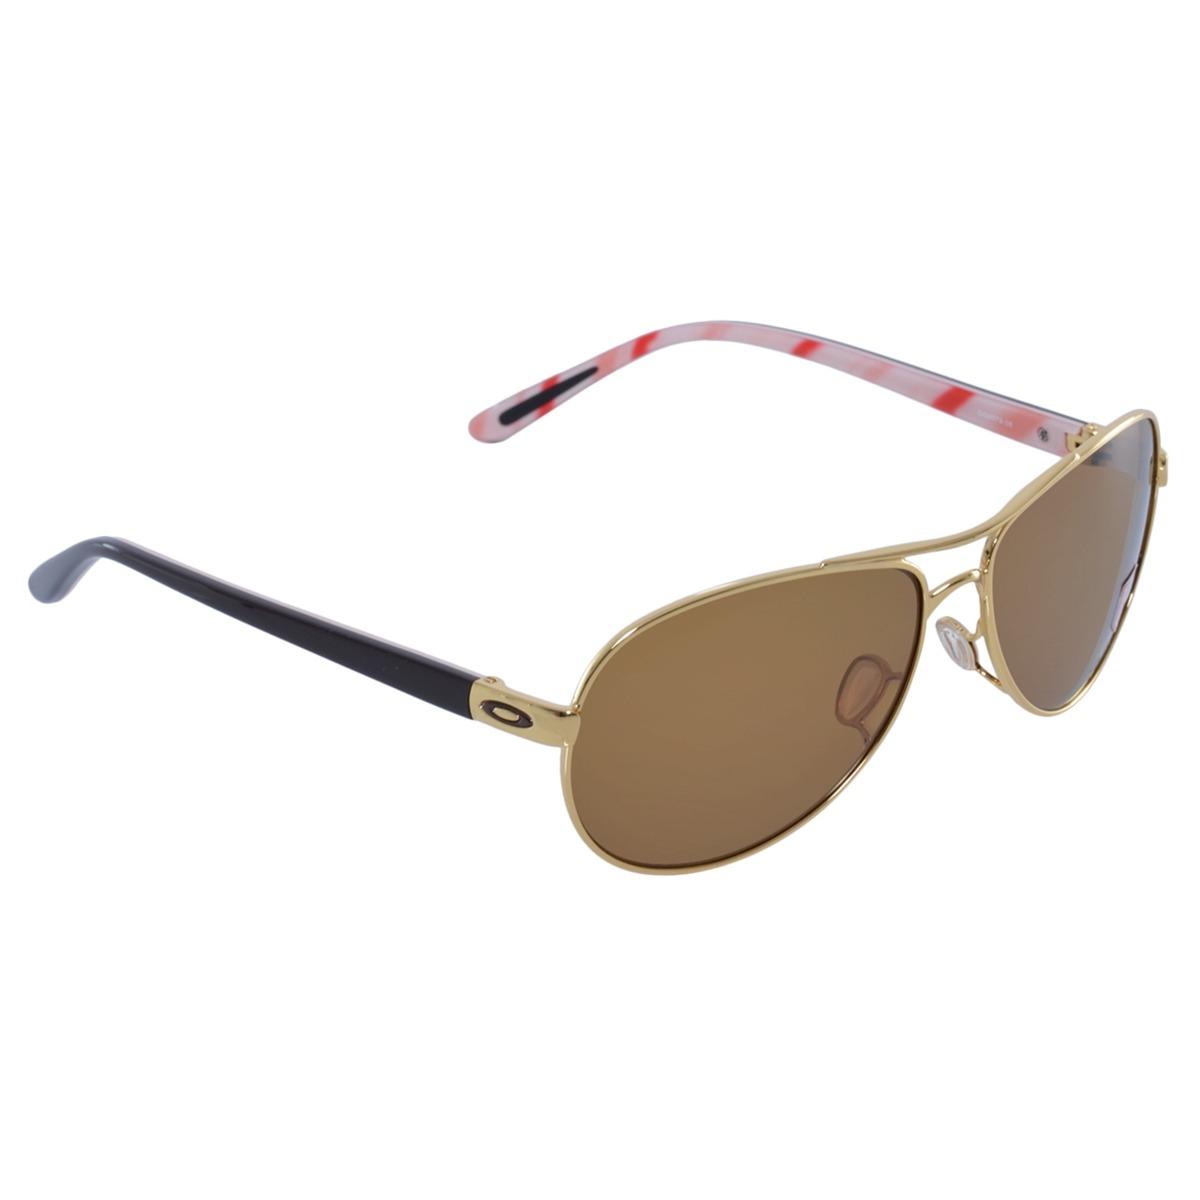 9dee9a836ae06 óculos oakley feedback polarized gold w bronze. Carregando zoom.